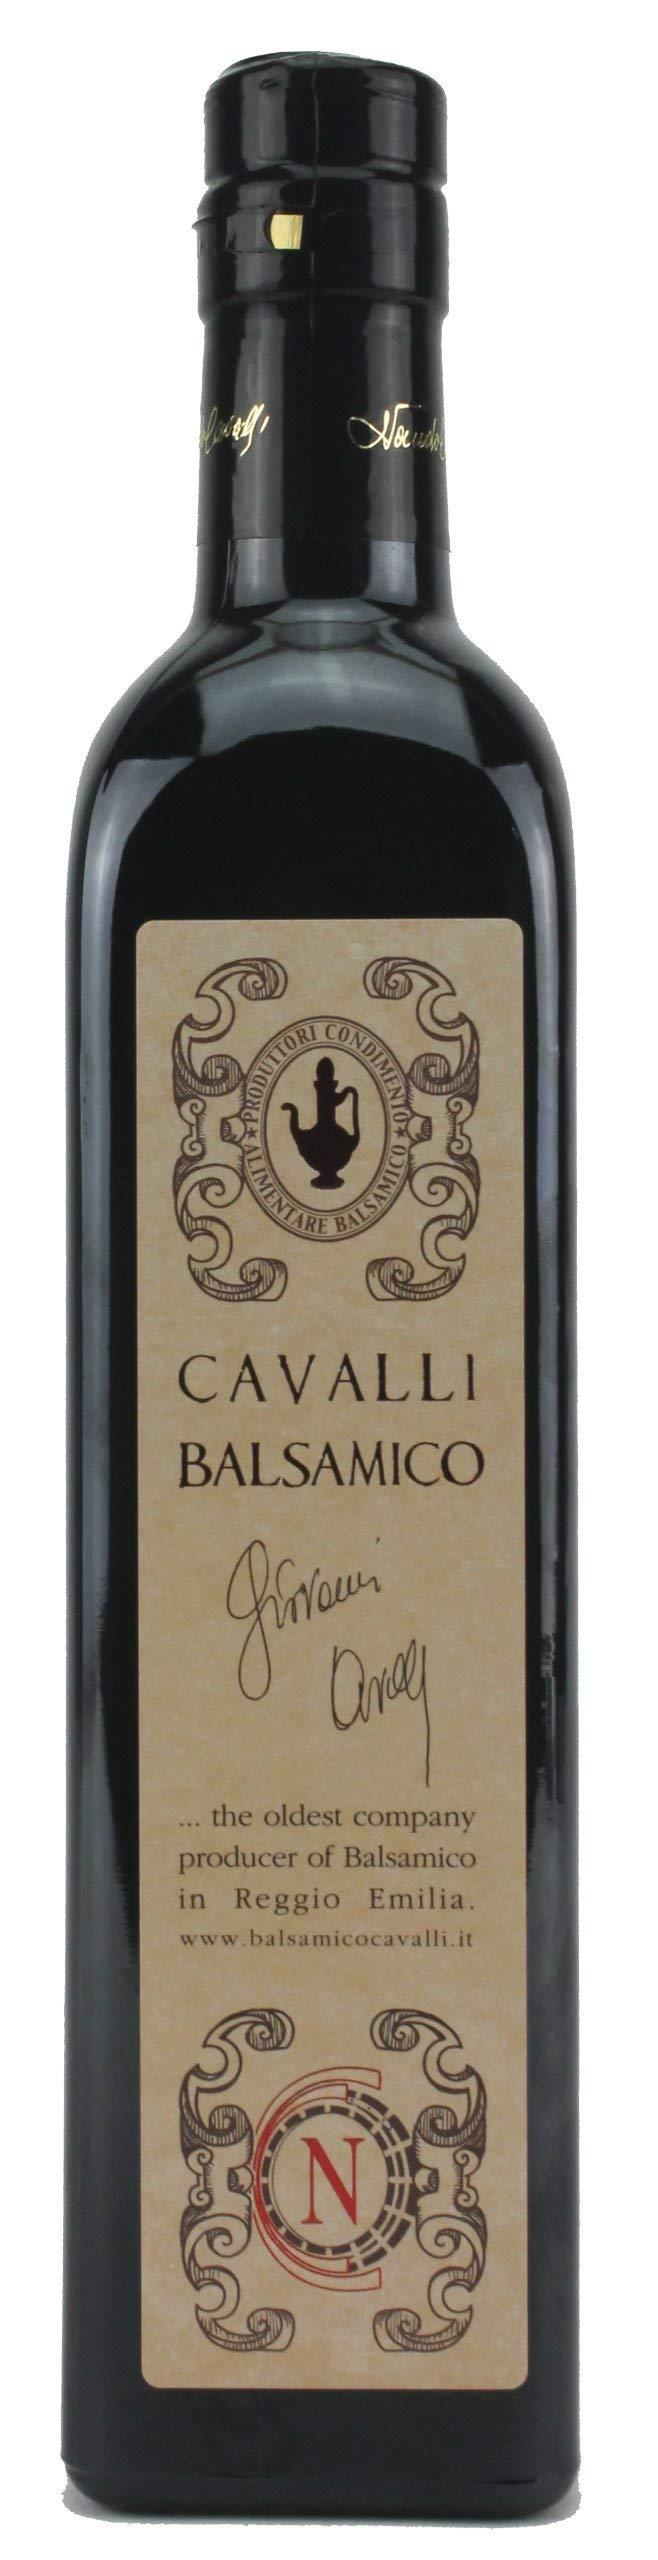 Cavalli Balsamic Condimento Balsamic Vinegar, 500ml (16.9oz) by Cavalli